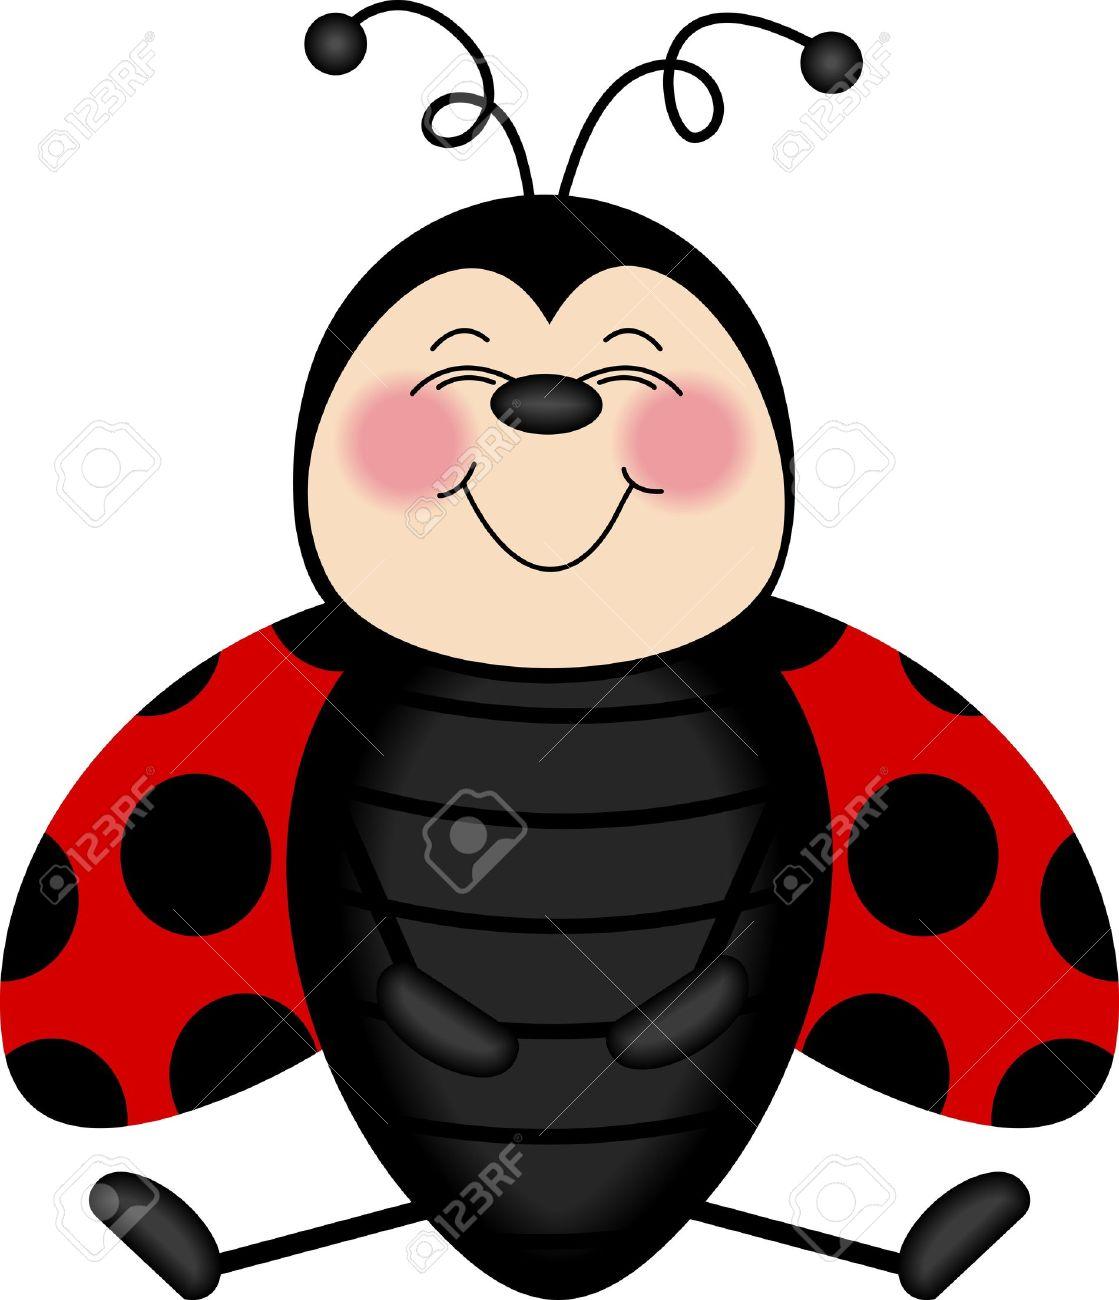 1119x1300 Cartoon Ladybug Clipart